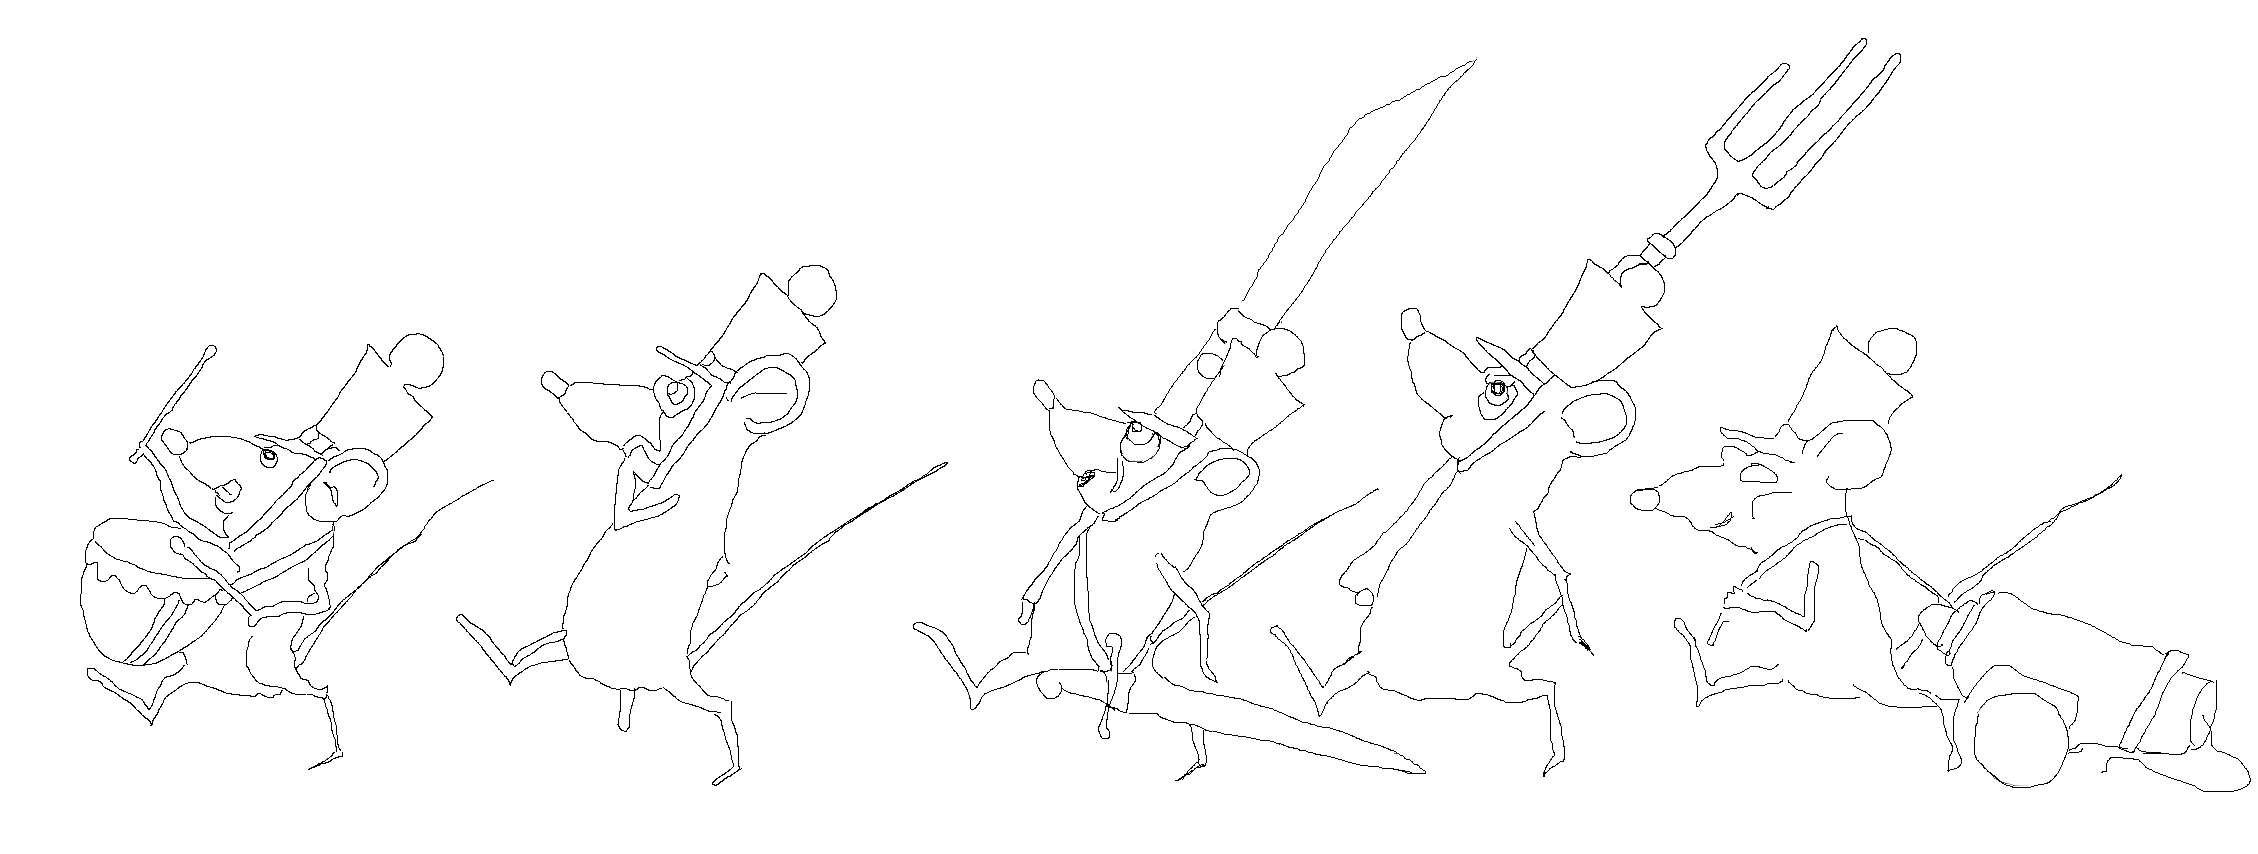 Мыши эскиз.jpg